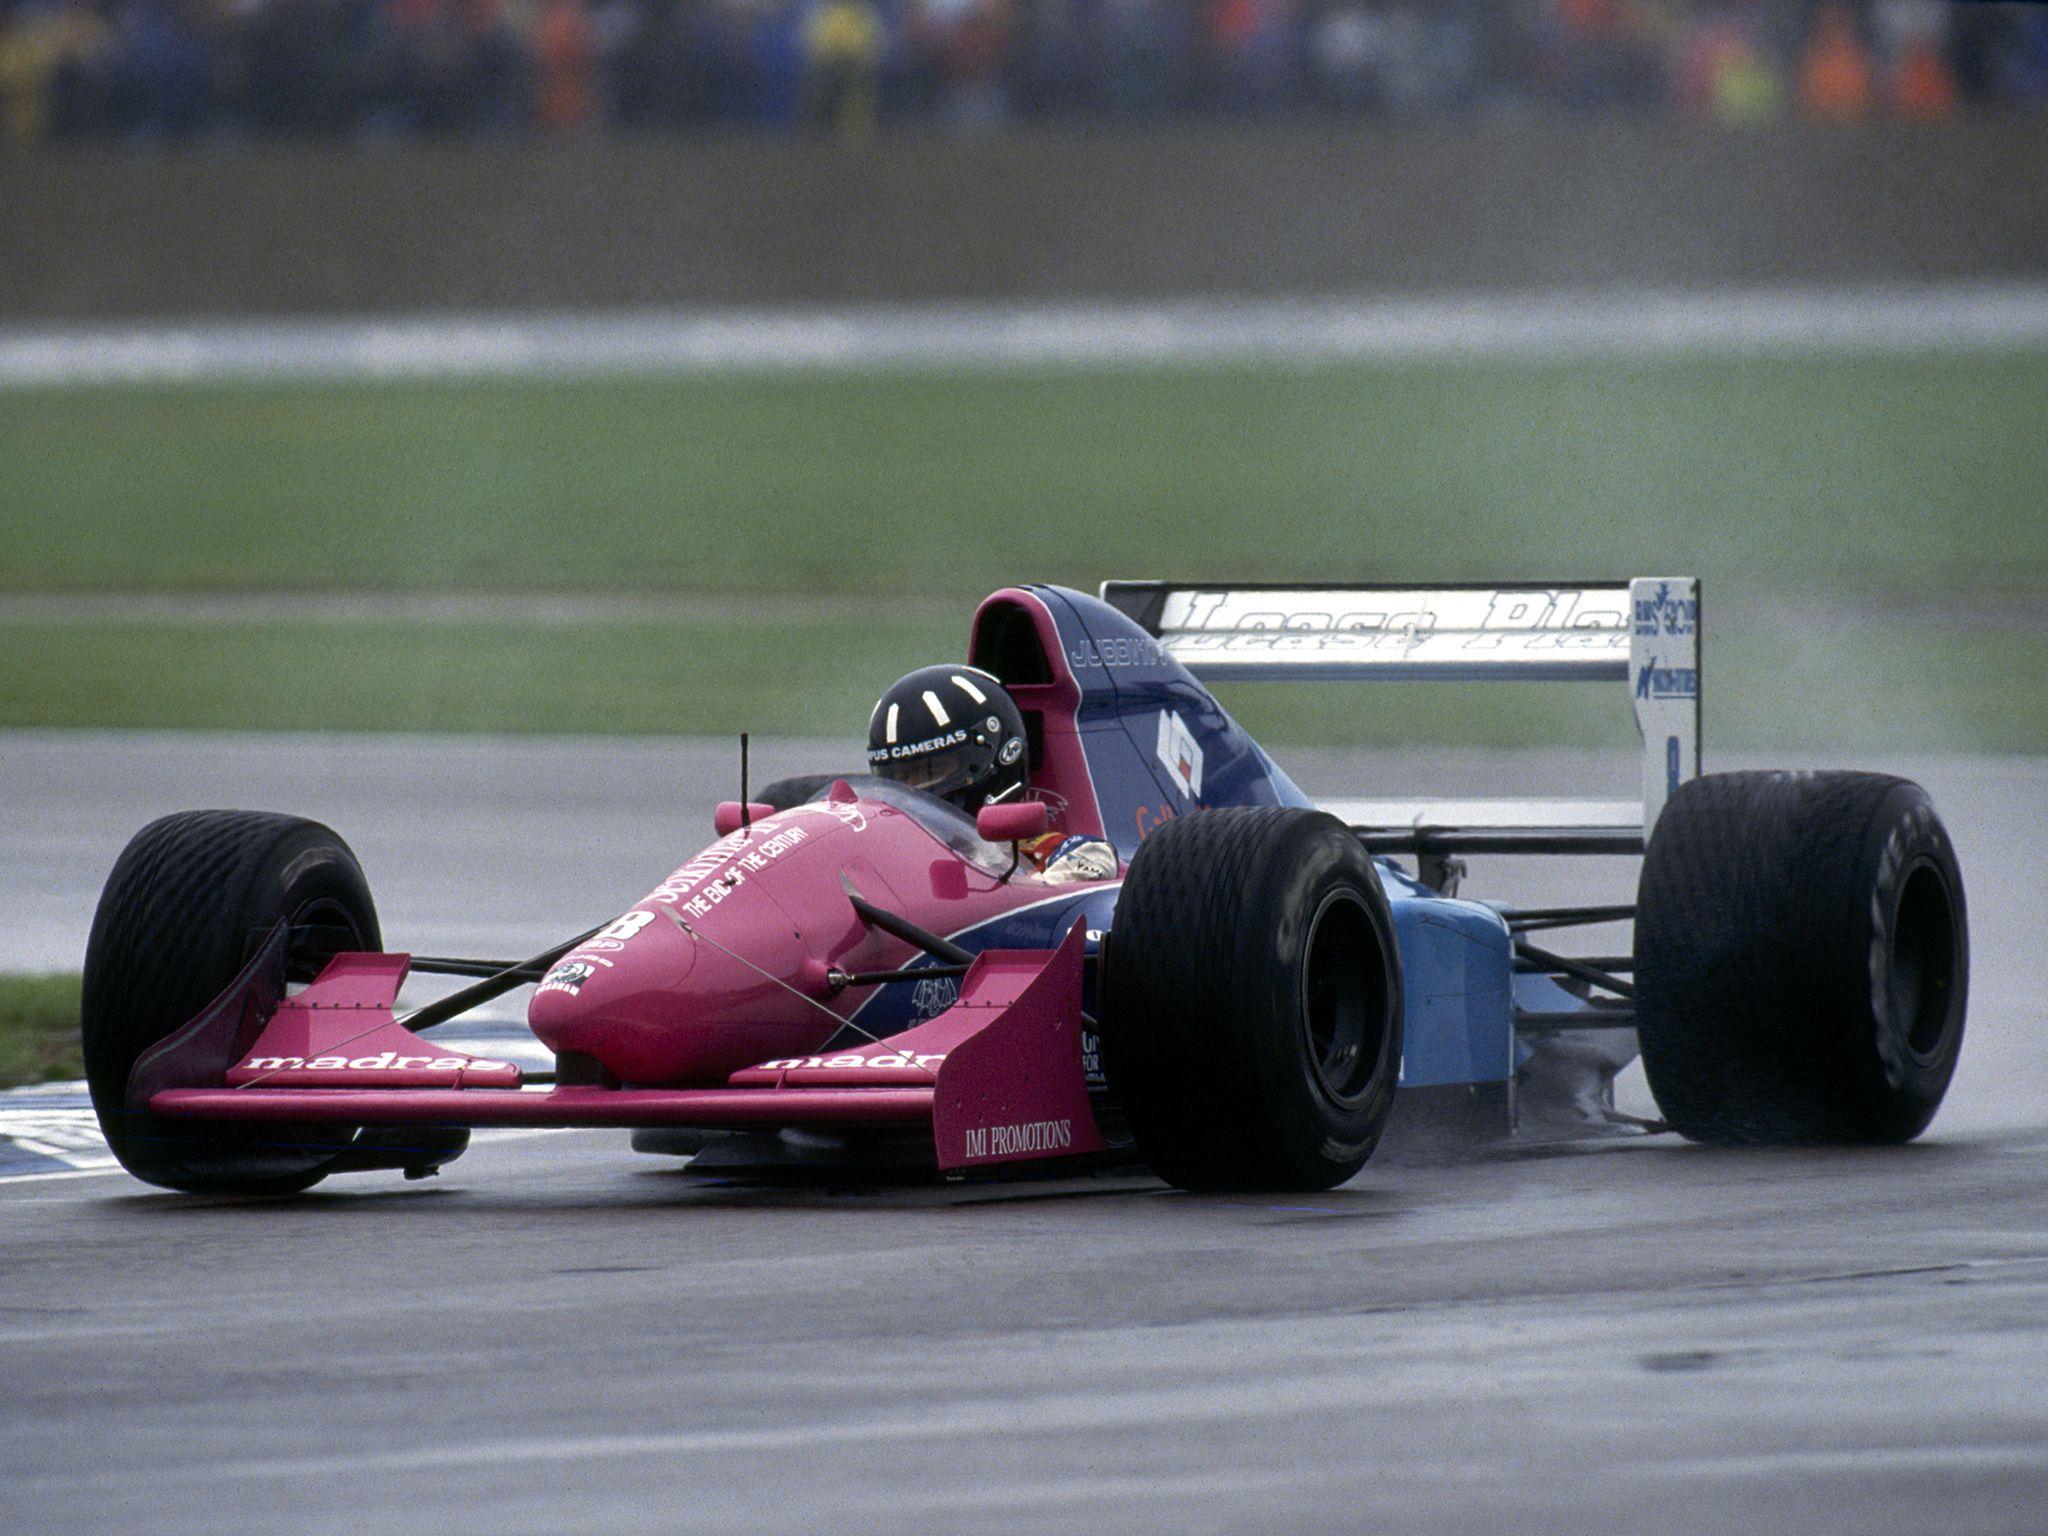 Brabham F1 - foto by Pinterest, Robin Dettingmeijer